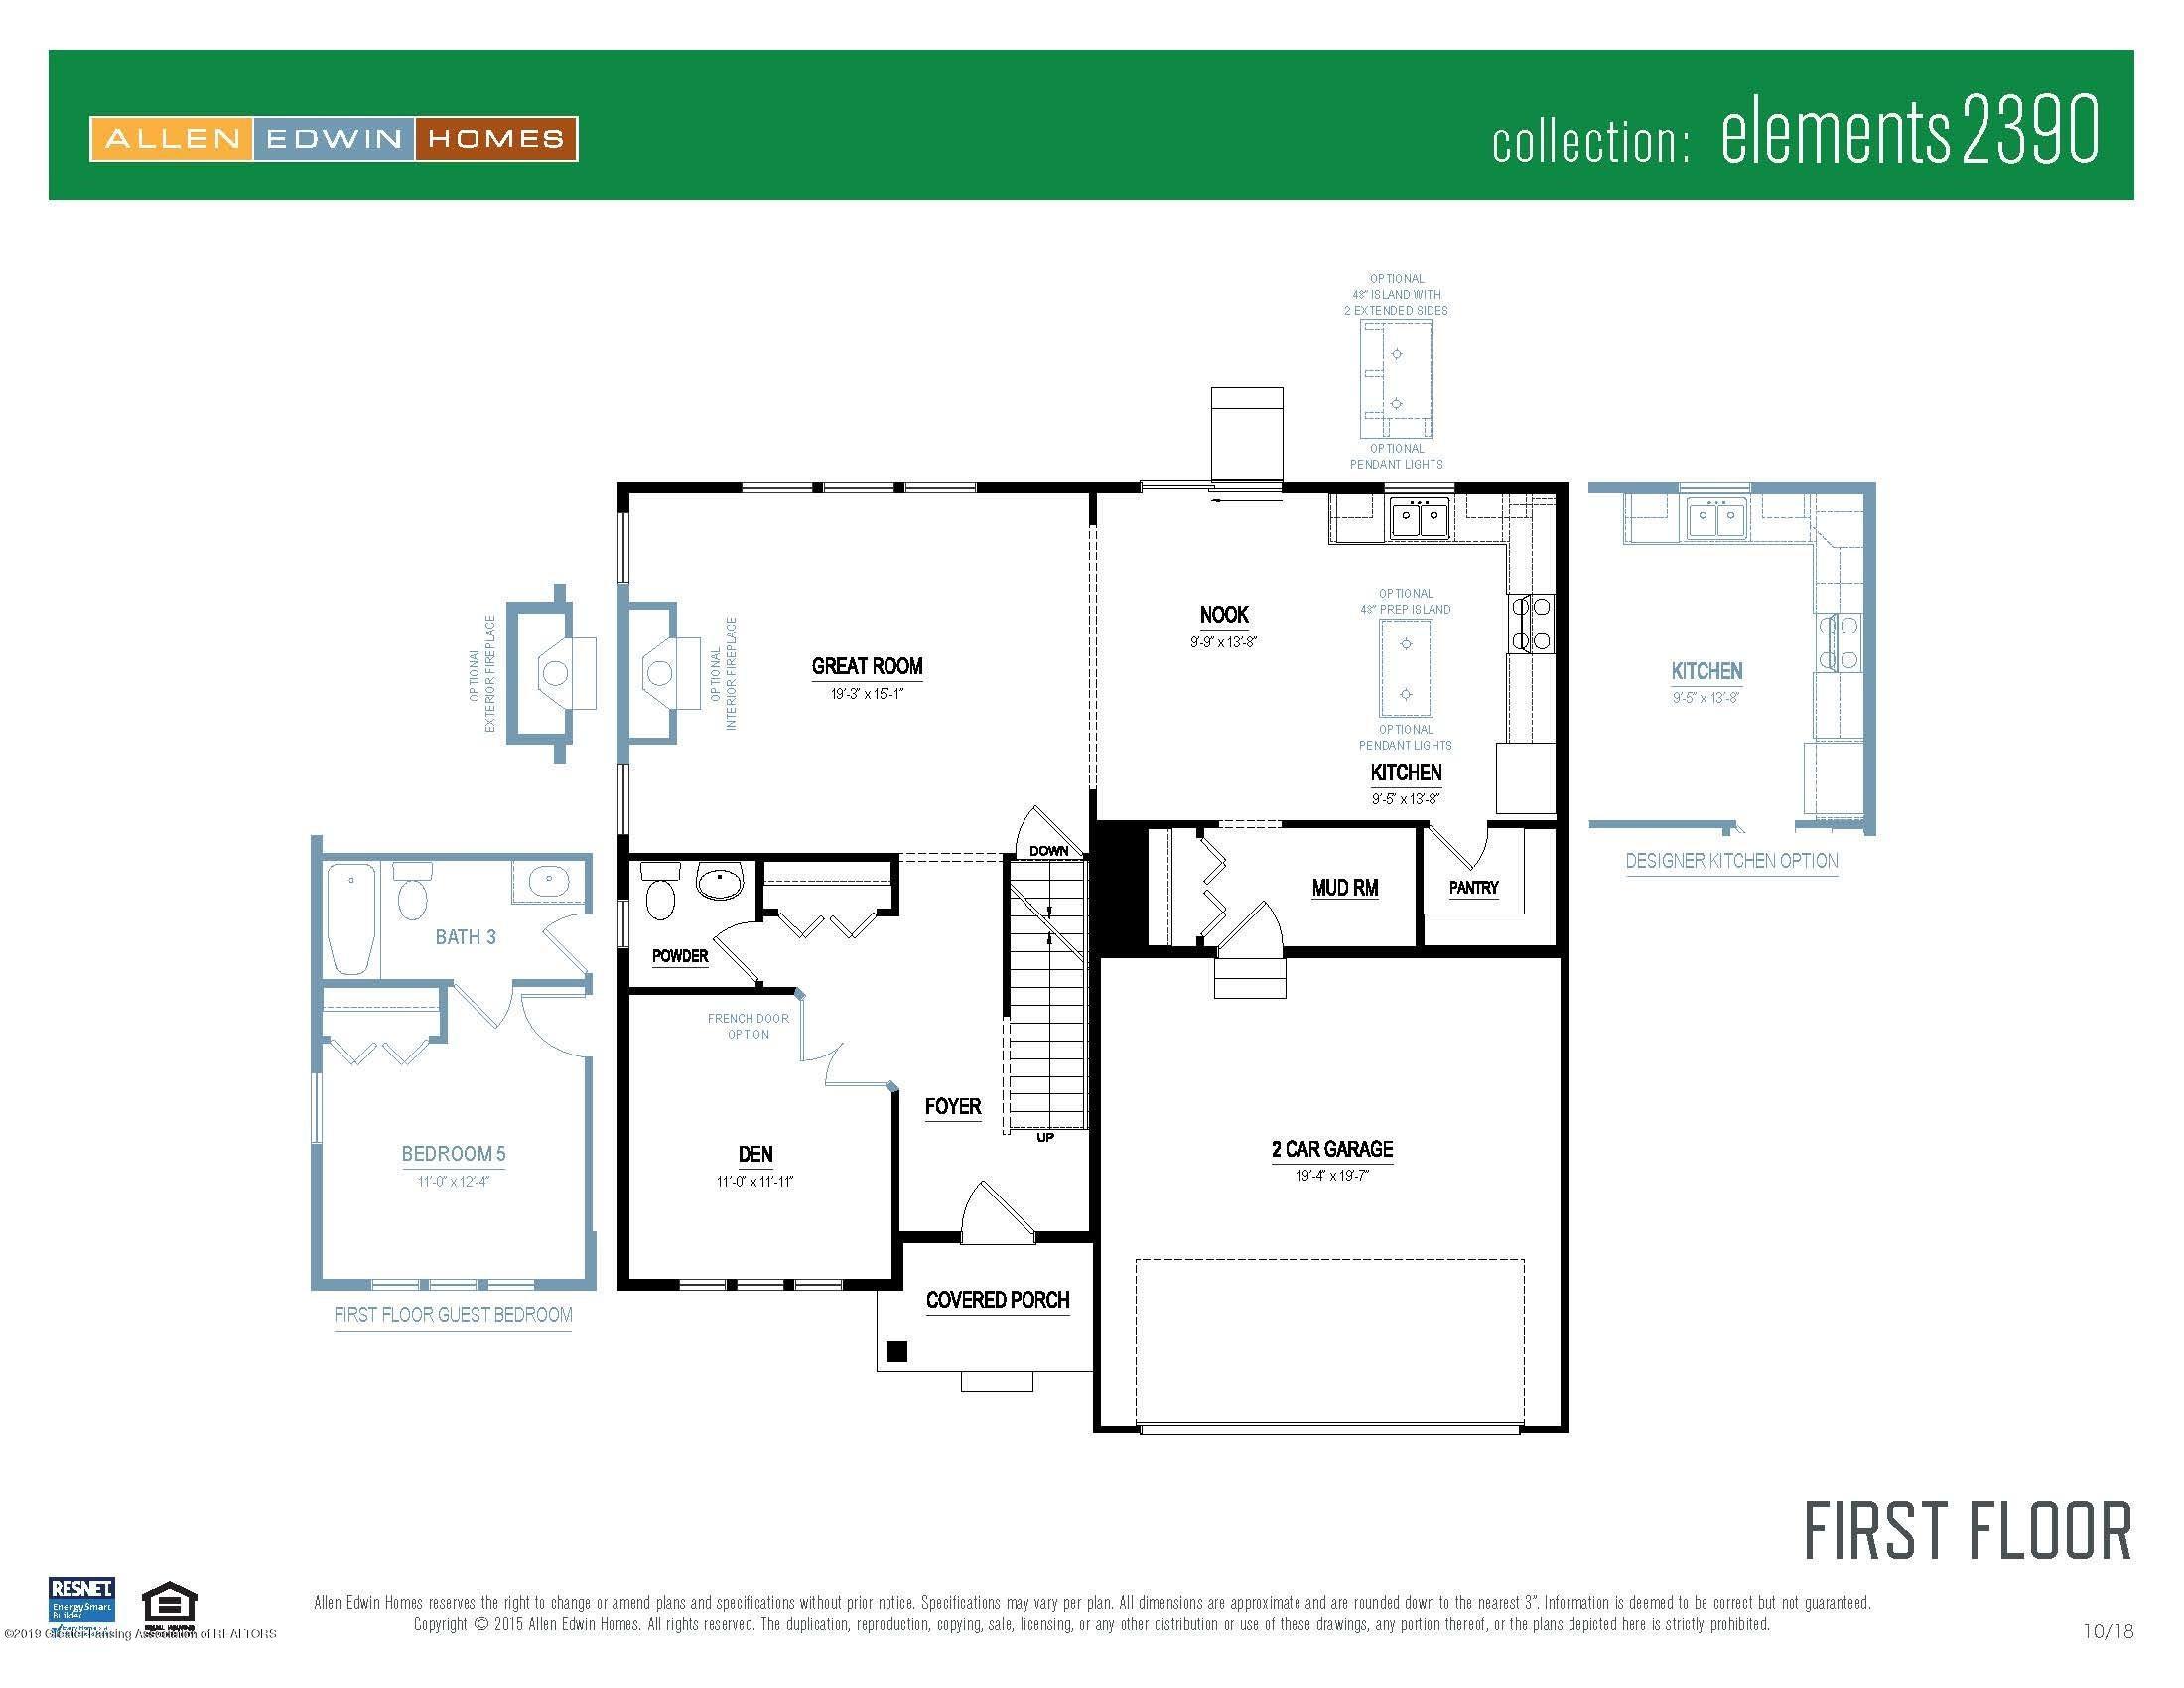 948 Pennine Ridge Way - Elements 2390 V8.0a First Floor - 24